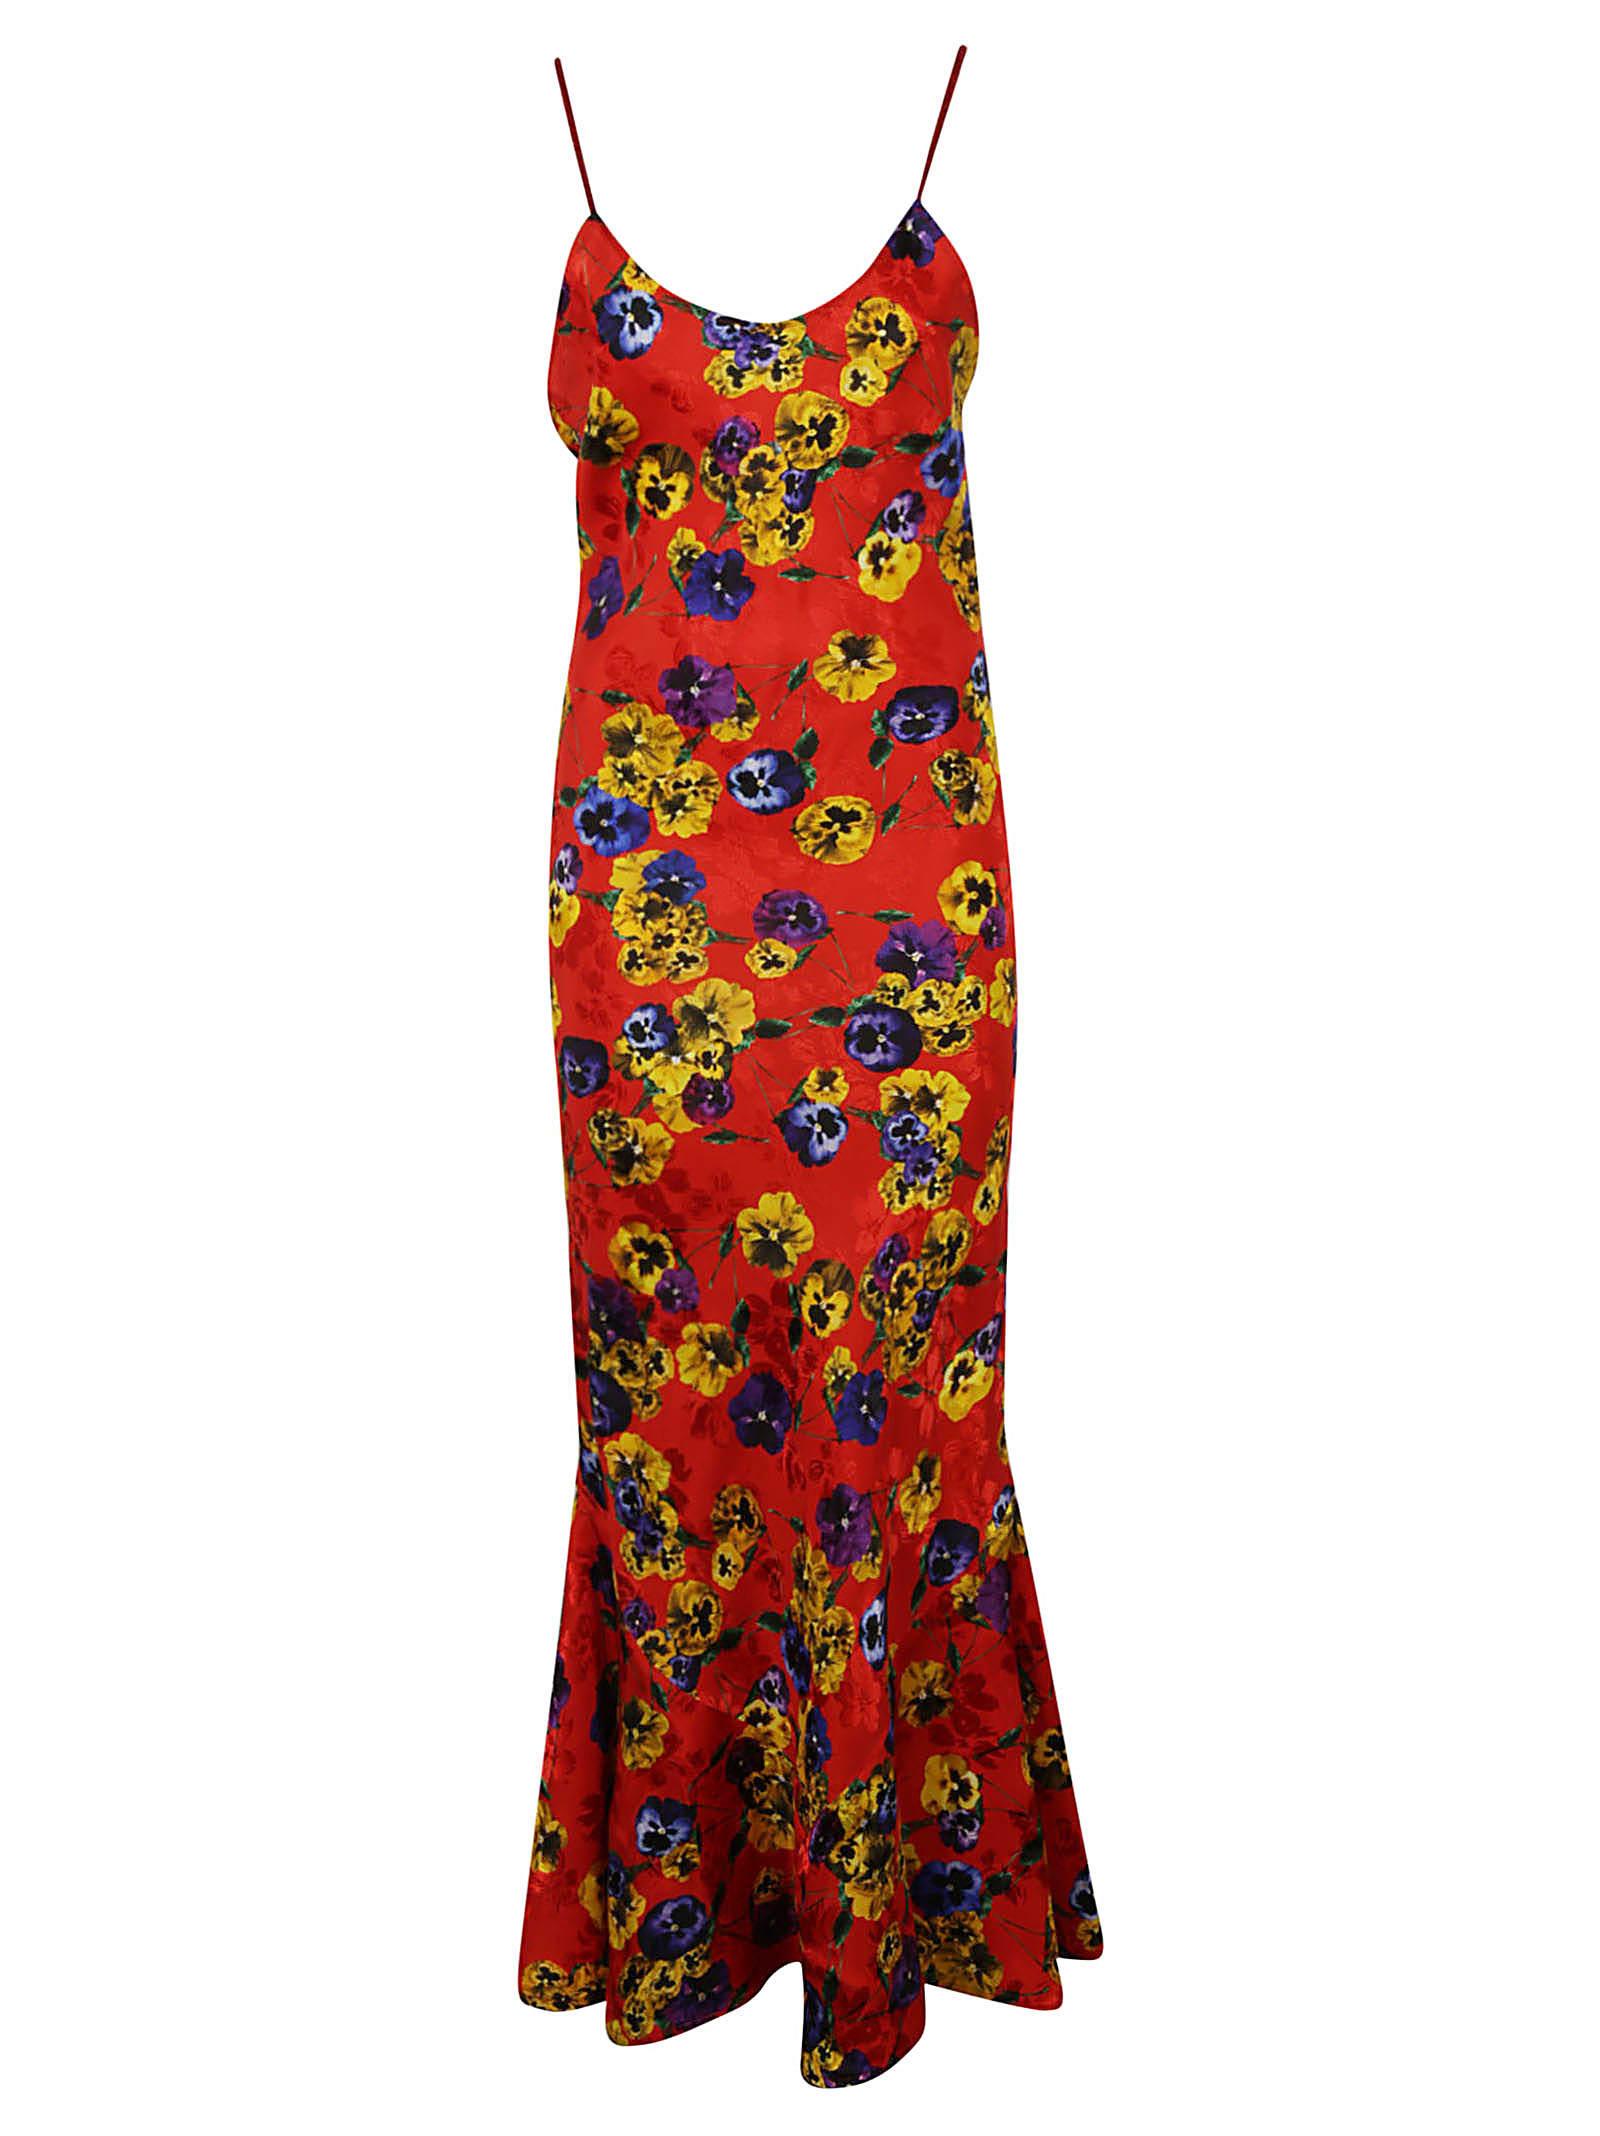 The Attico Floral Printed Maxi Dress